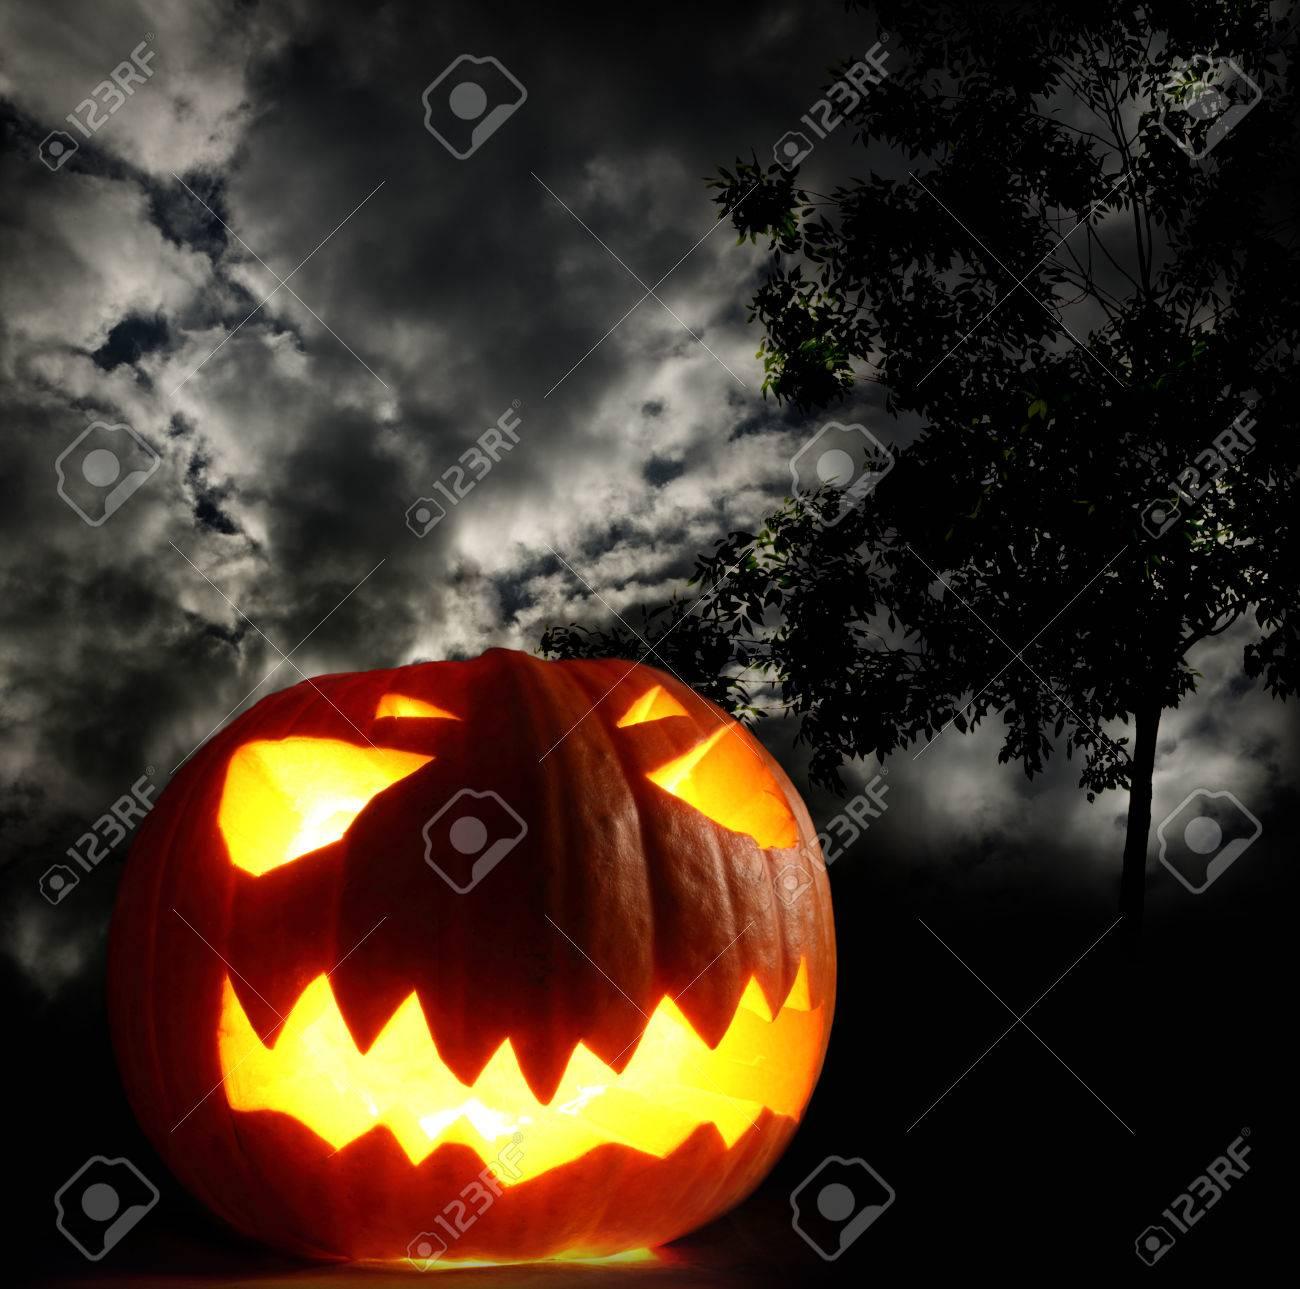 Angry halloween pumpkin on thunder sky background Stock Photo - 22471857